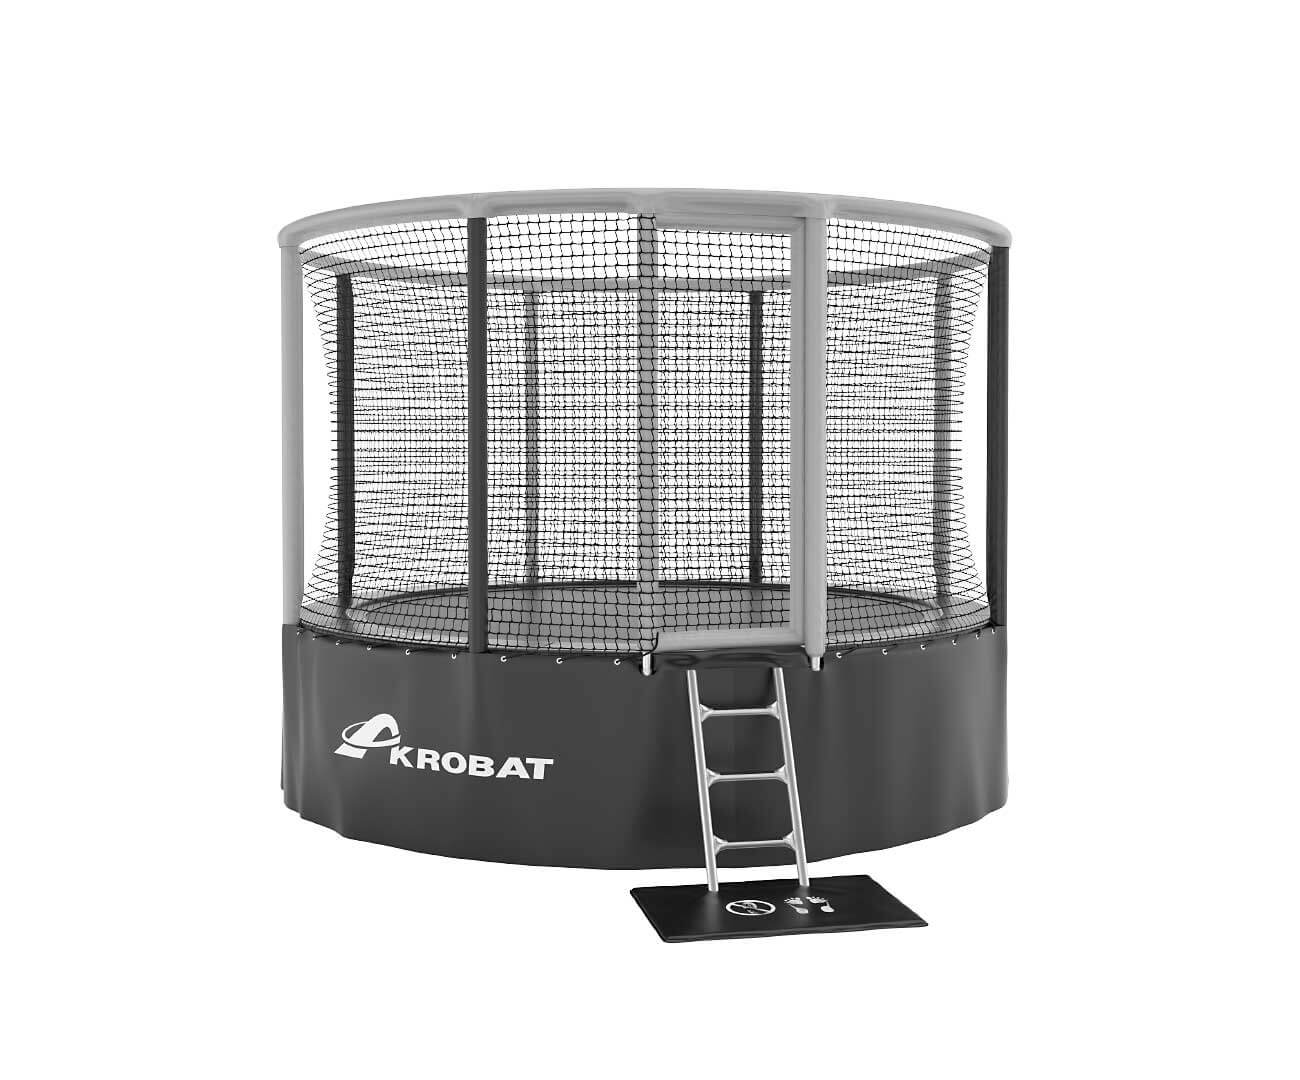 Akrobat Gallus Grey-black enclosure /Black safety pad/ Grey jumping mat